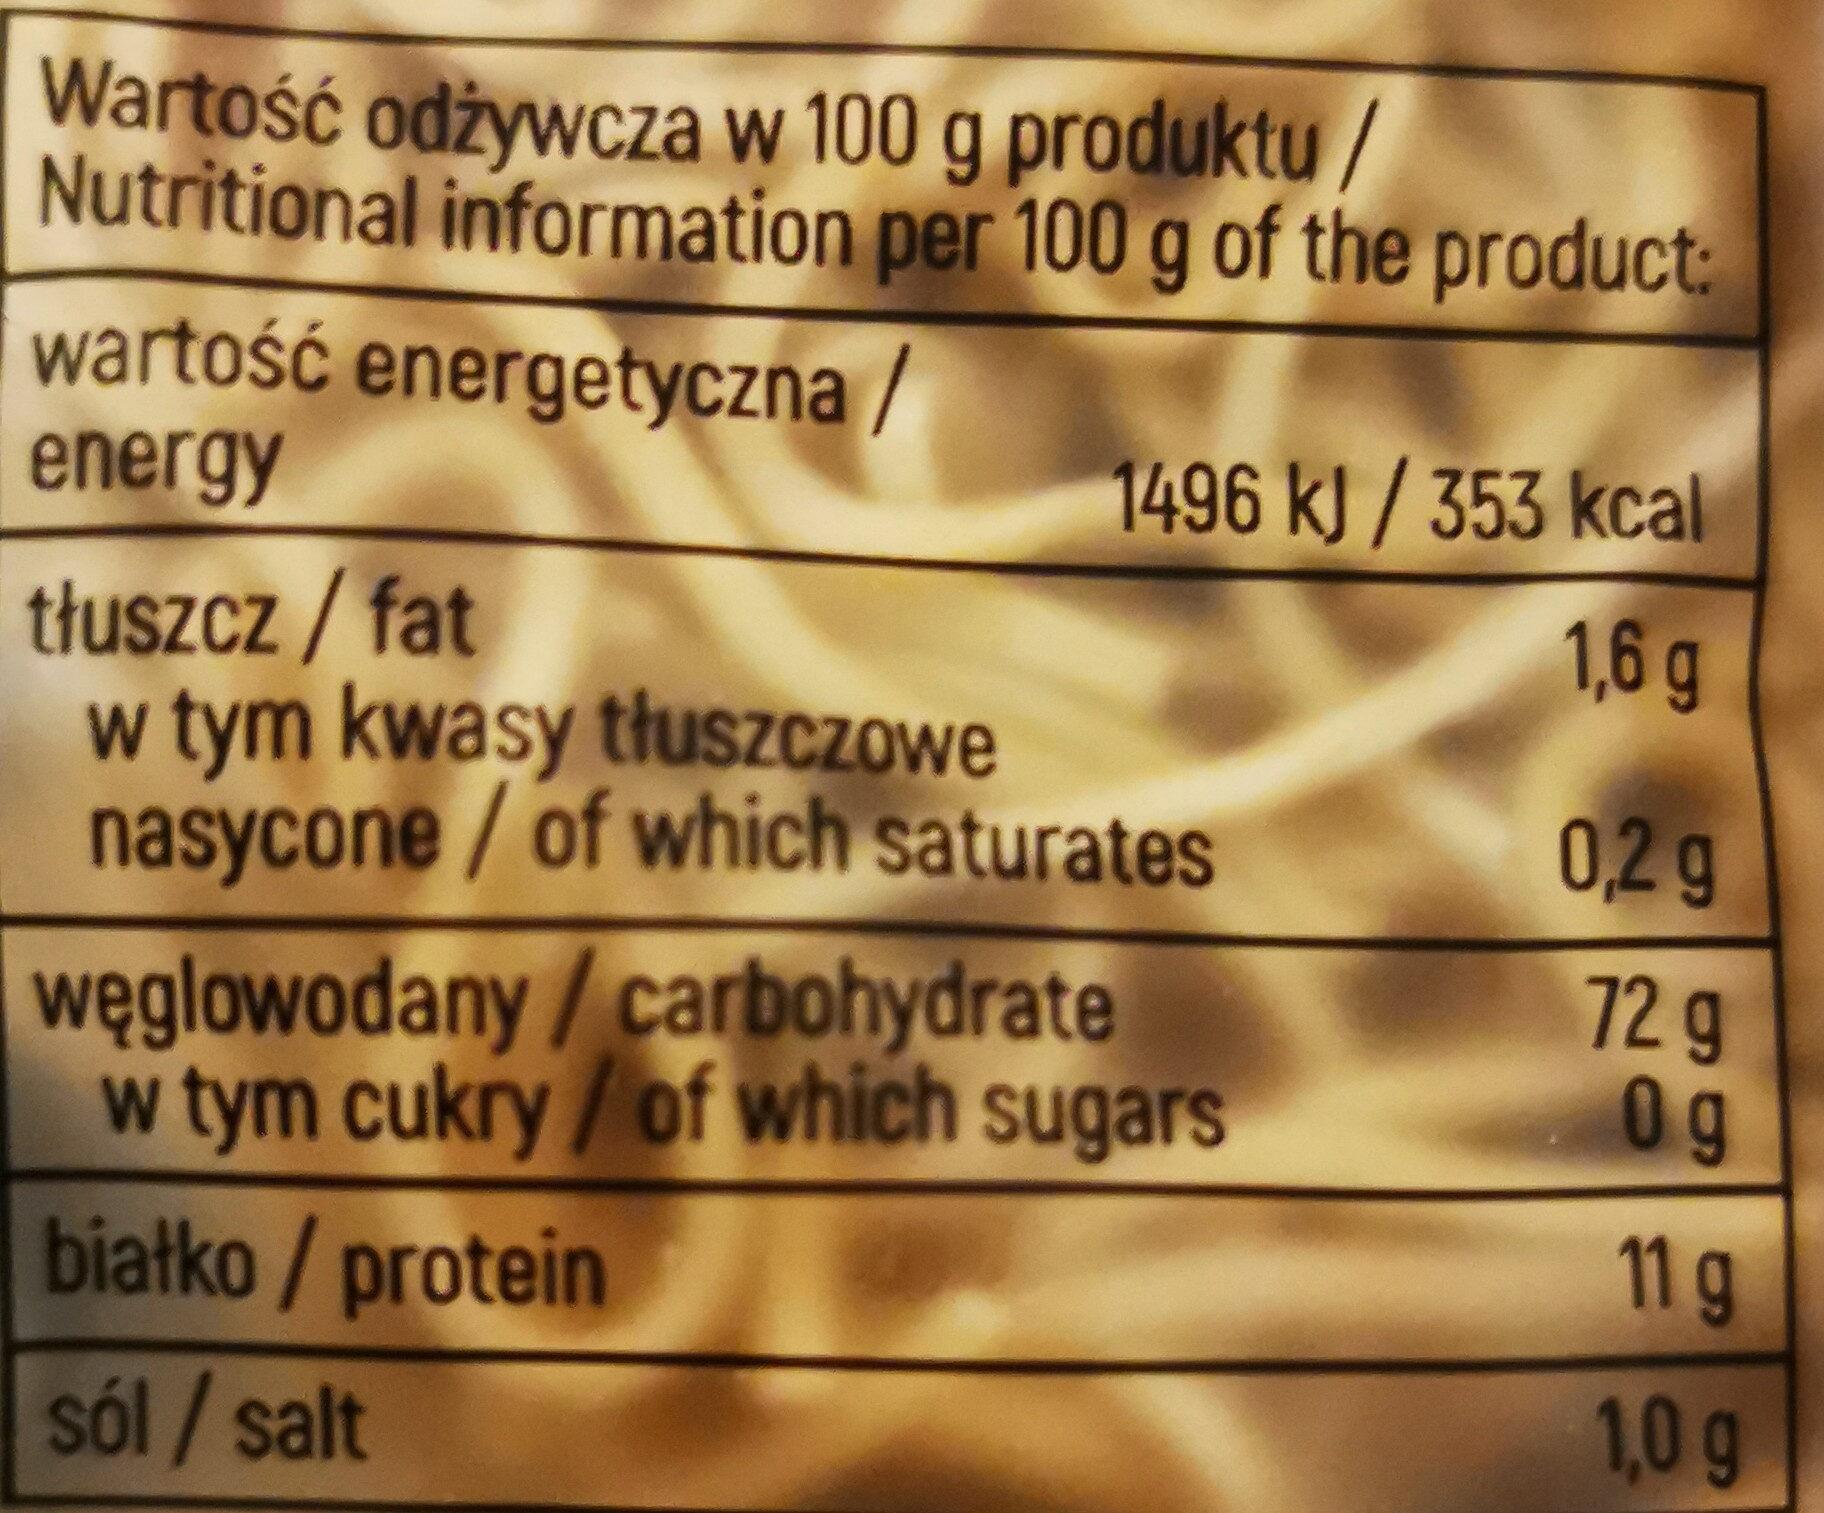 Makaron pszenny Mie - Nutrition facts - en